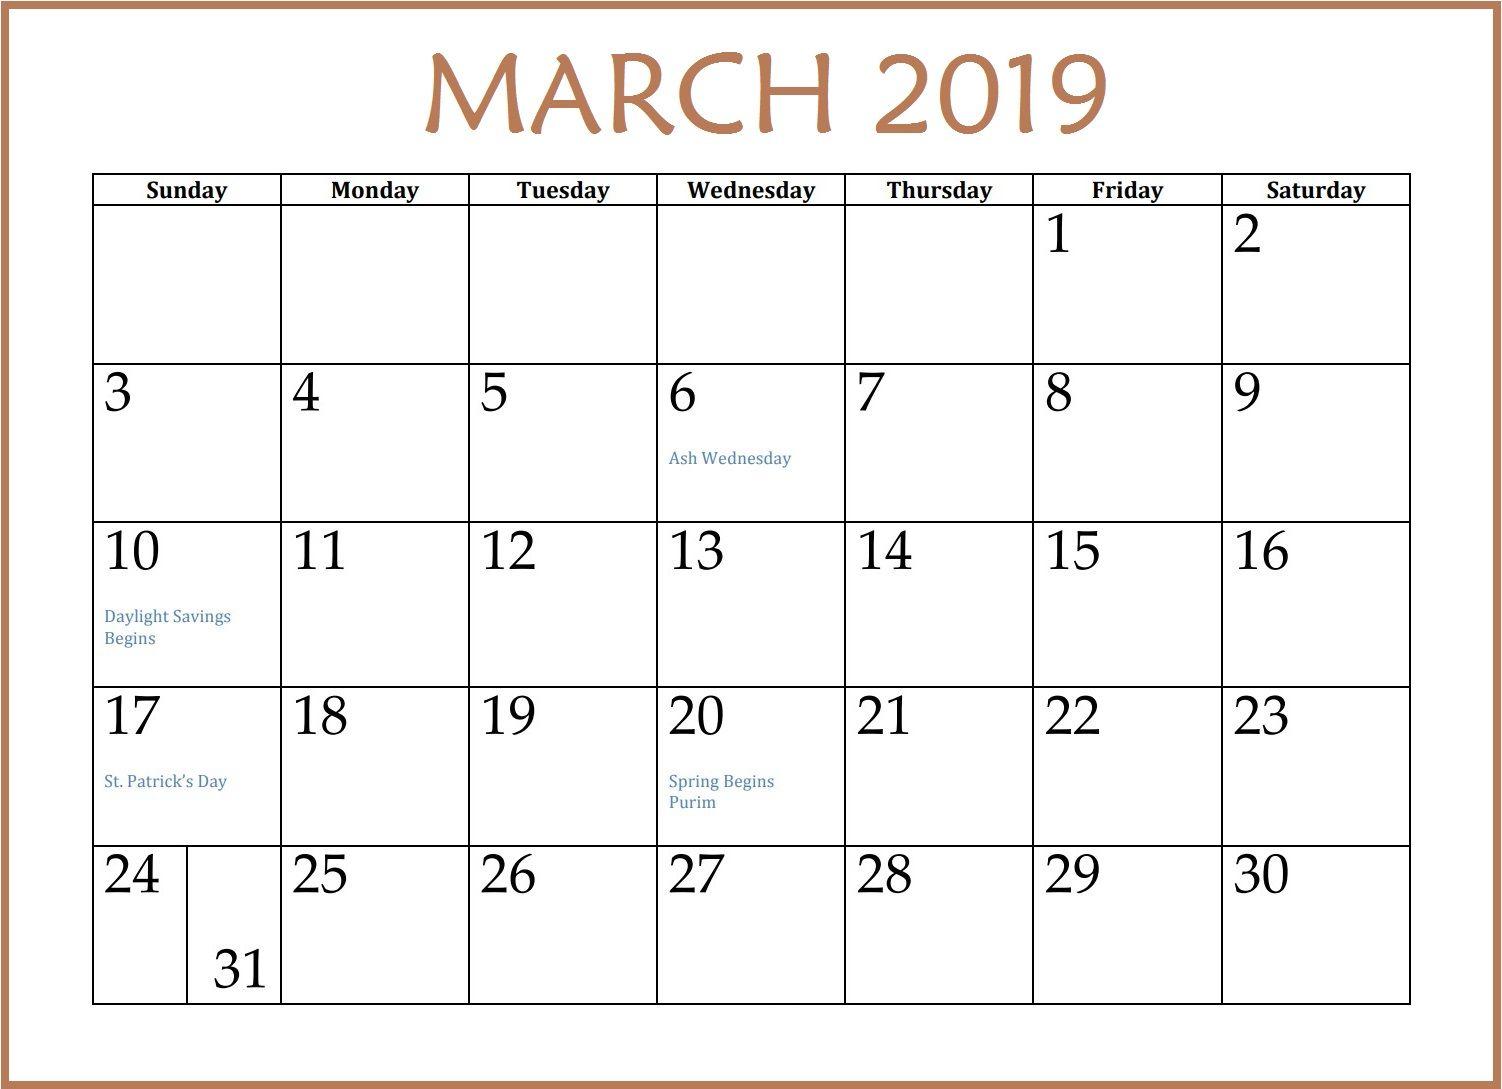 March Calendar Printable Marchcalendar March Calendar Calendarmarch